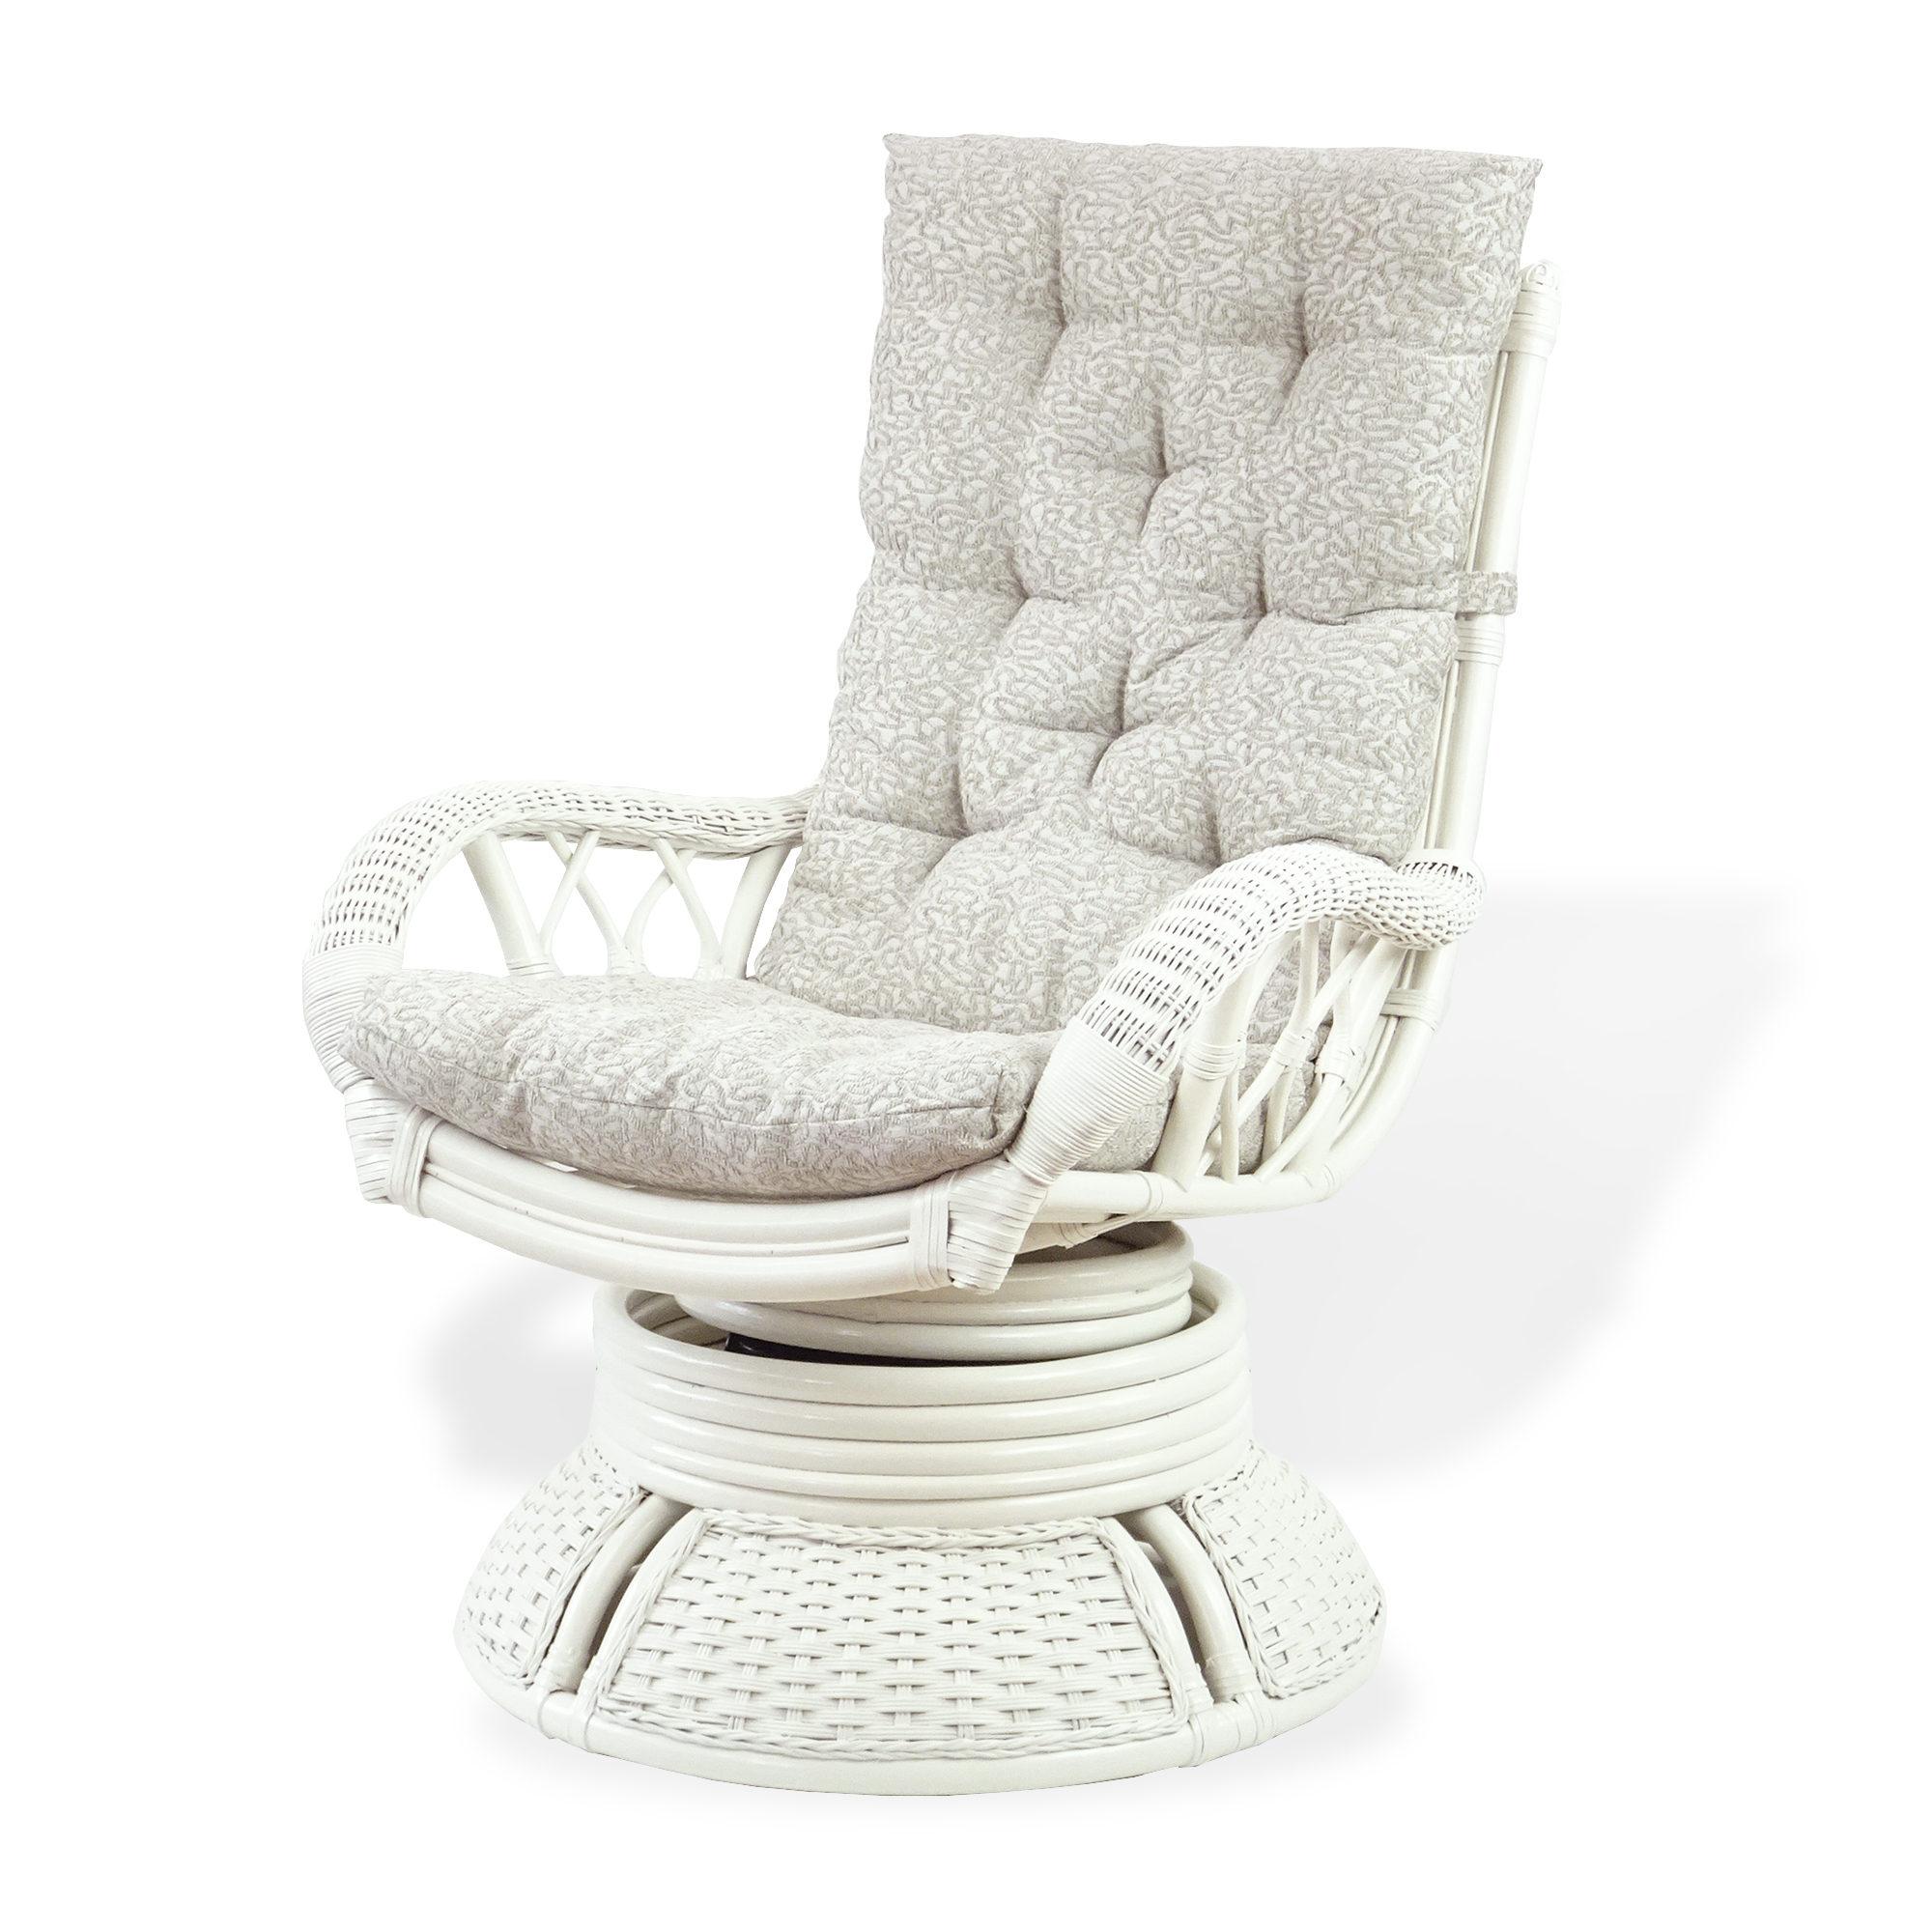 Awesome Alexa Swivel Rocking Chair Theyellowbook Wood Chair Design Ideas Theyellowbookinfo